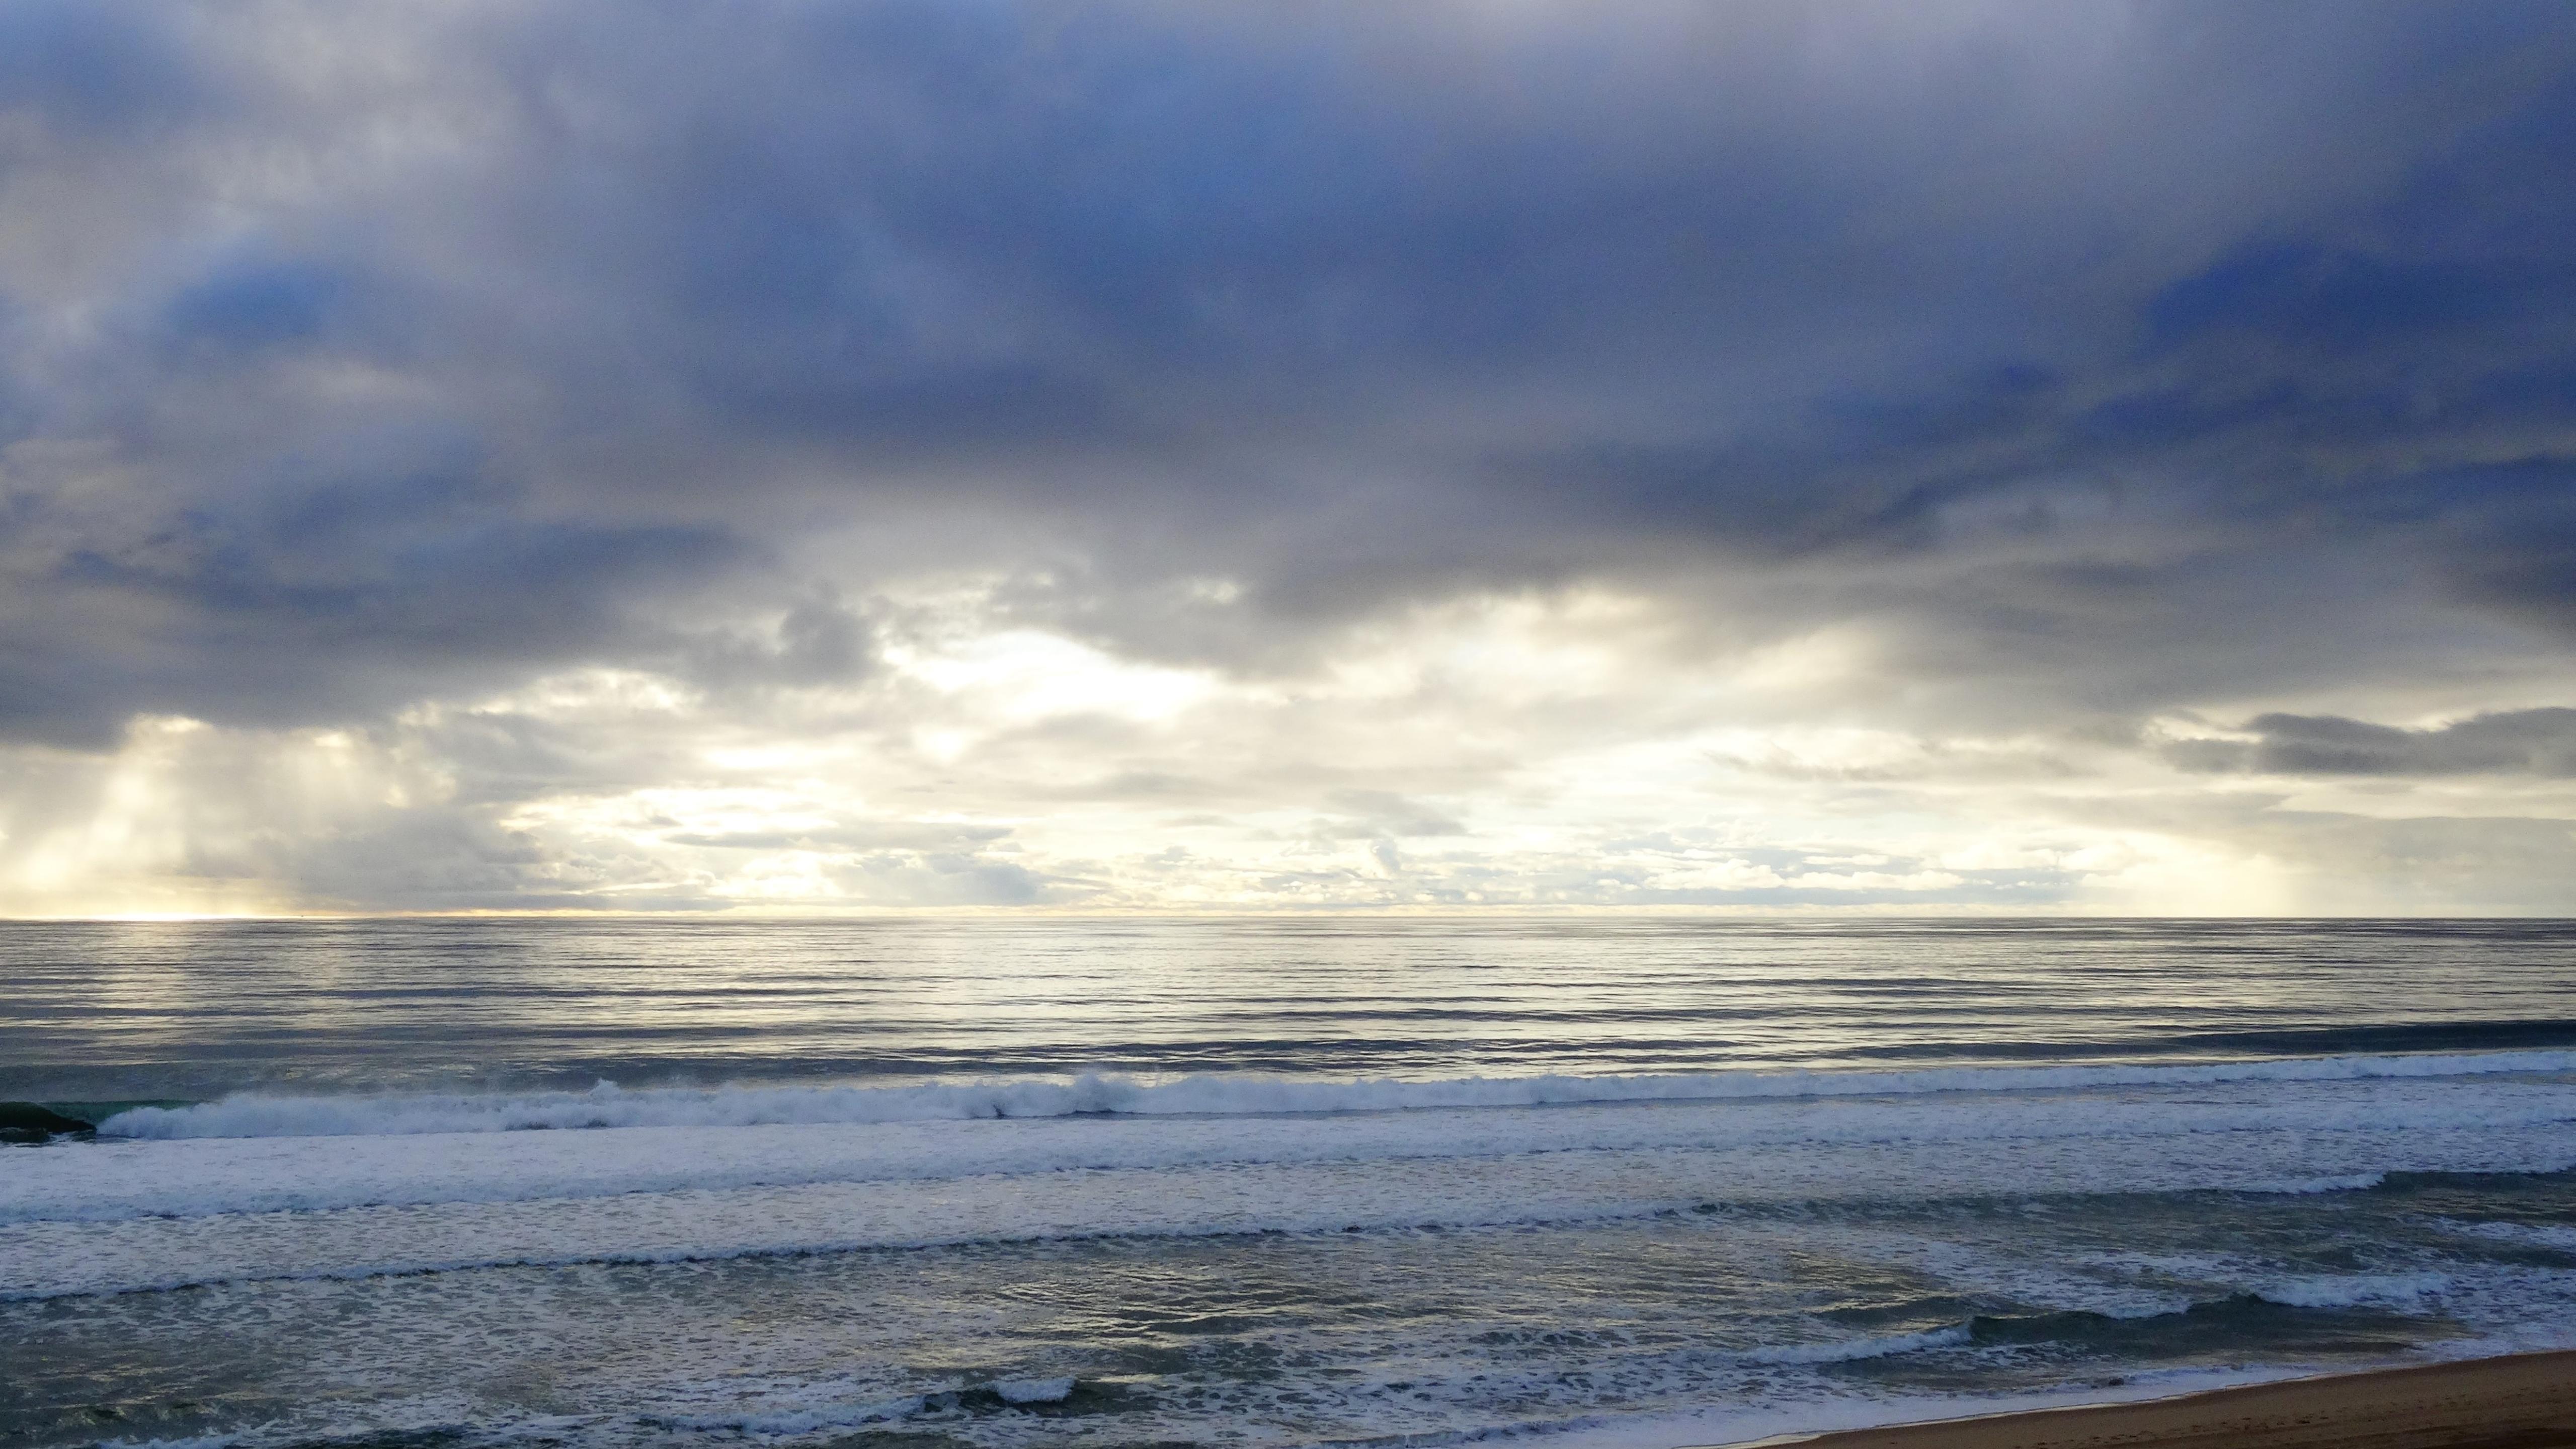 5120x2880 Atlantic Ocean Sand Beach 5k Wallpaper Hd Nature 4k